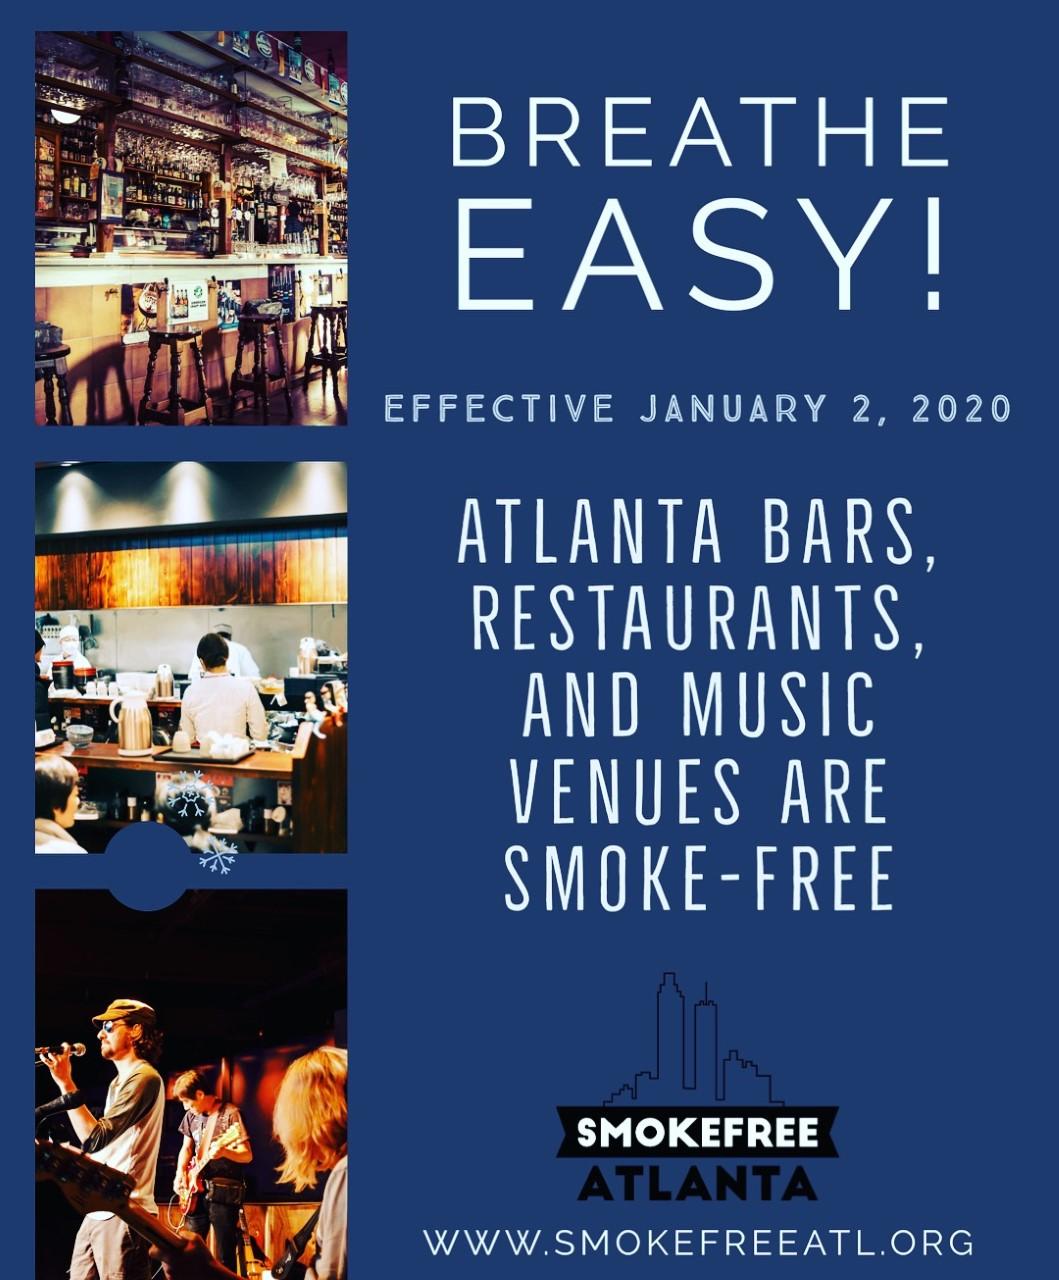 Atlanta is smokefree